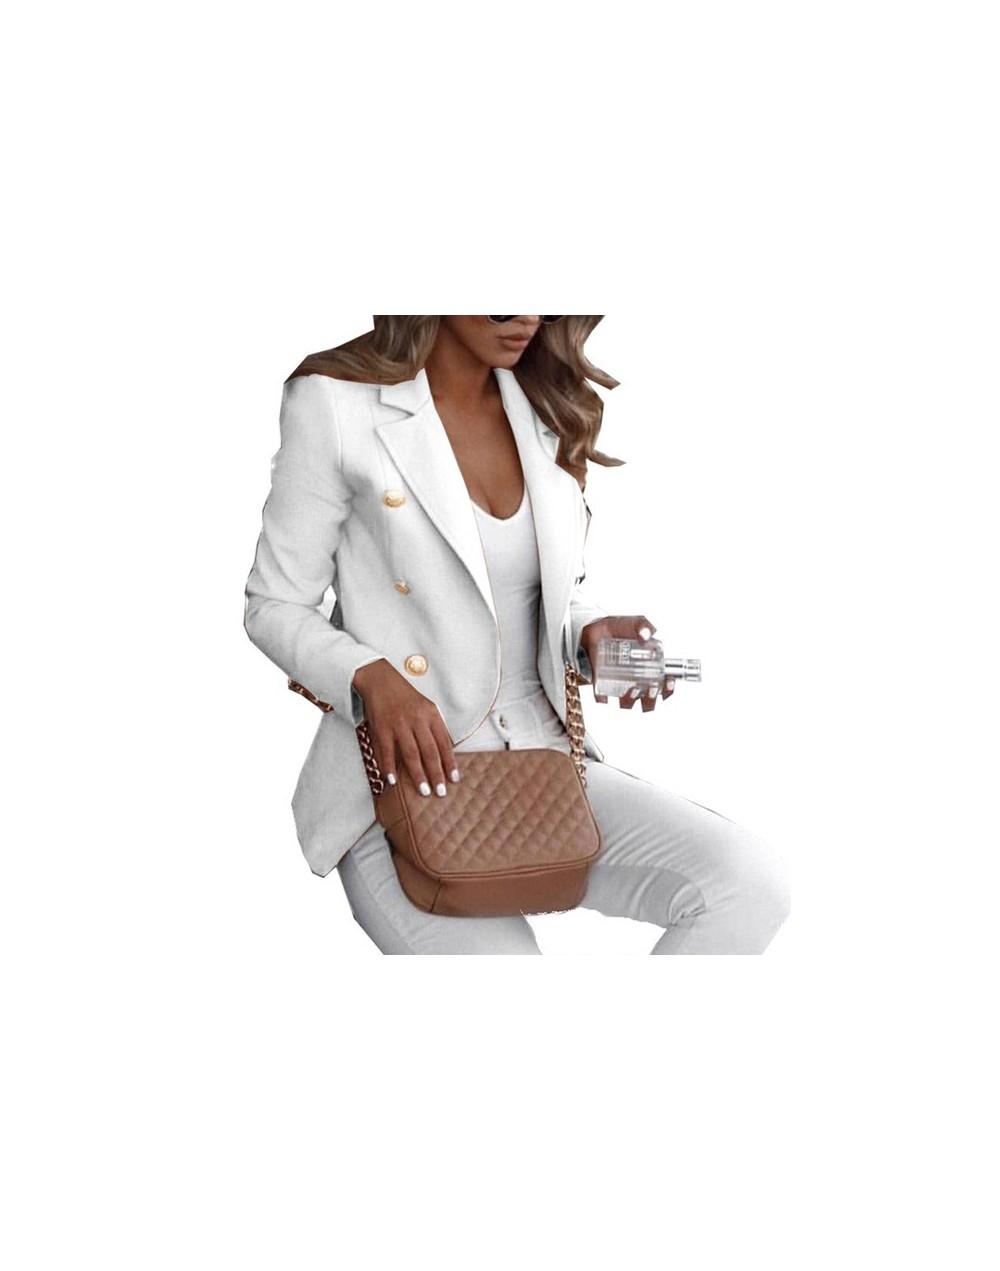 Ladies Elegant Slim Solid Color Suit Tops Female Long Sleeve Casual Short Coat for Spring Autumn H9 - White - 5U111257310256-5